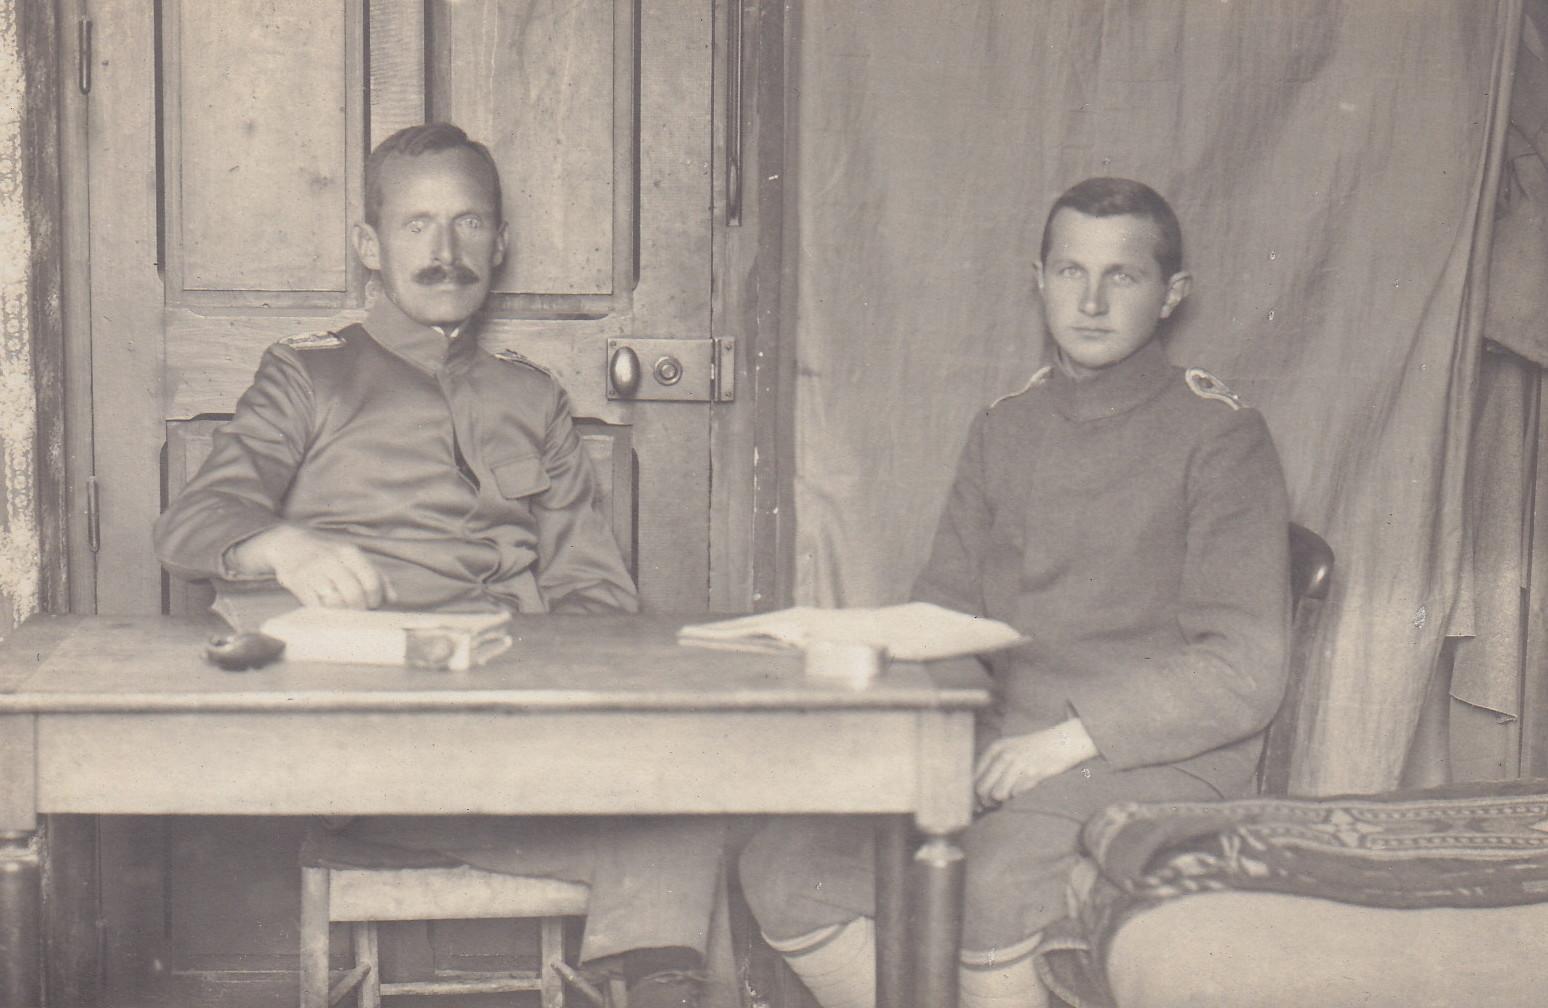 Leutnant Steger und Leutnant Rahner auf der Stube